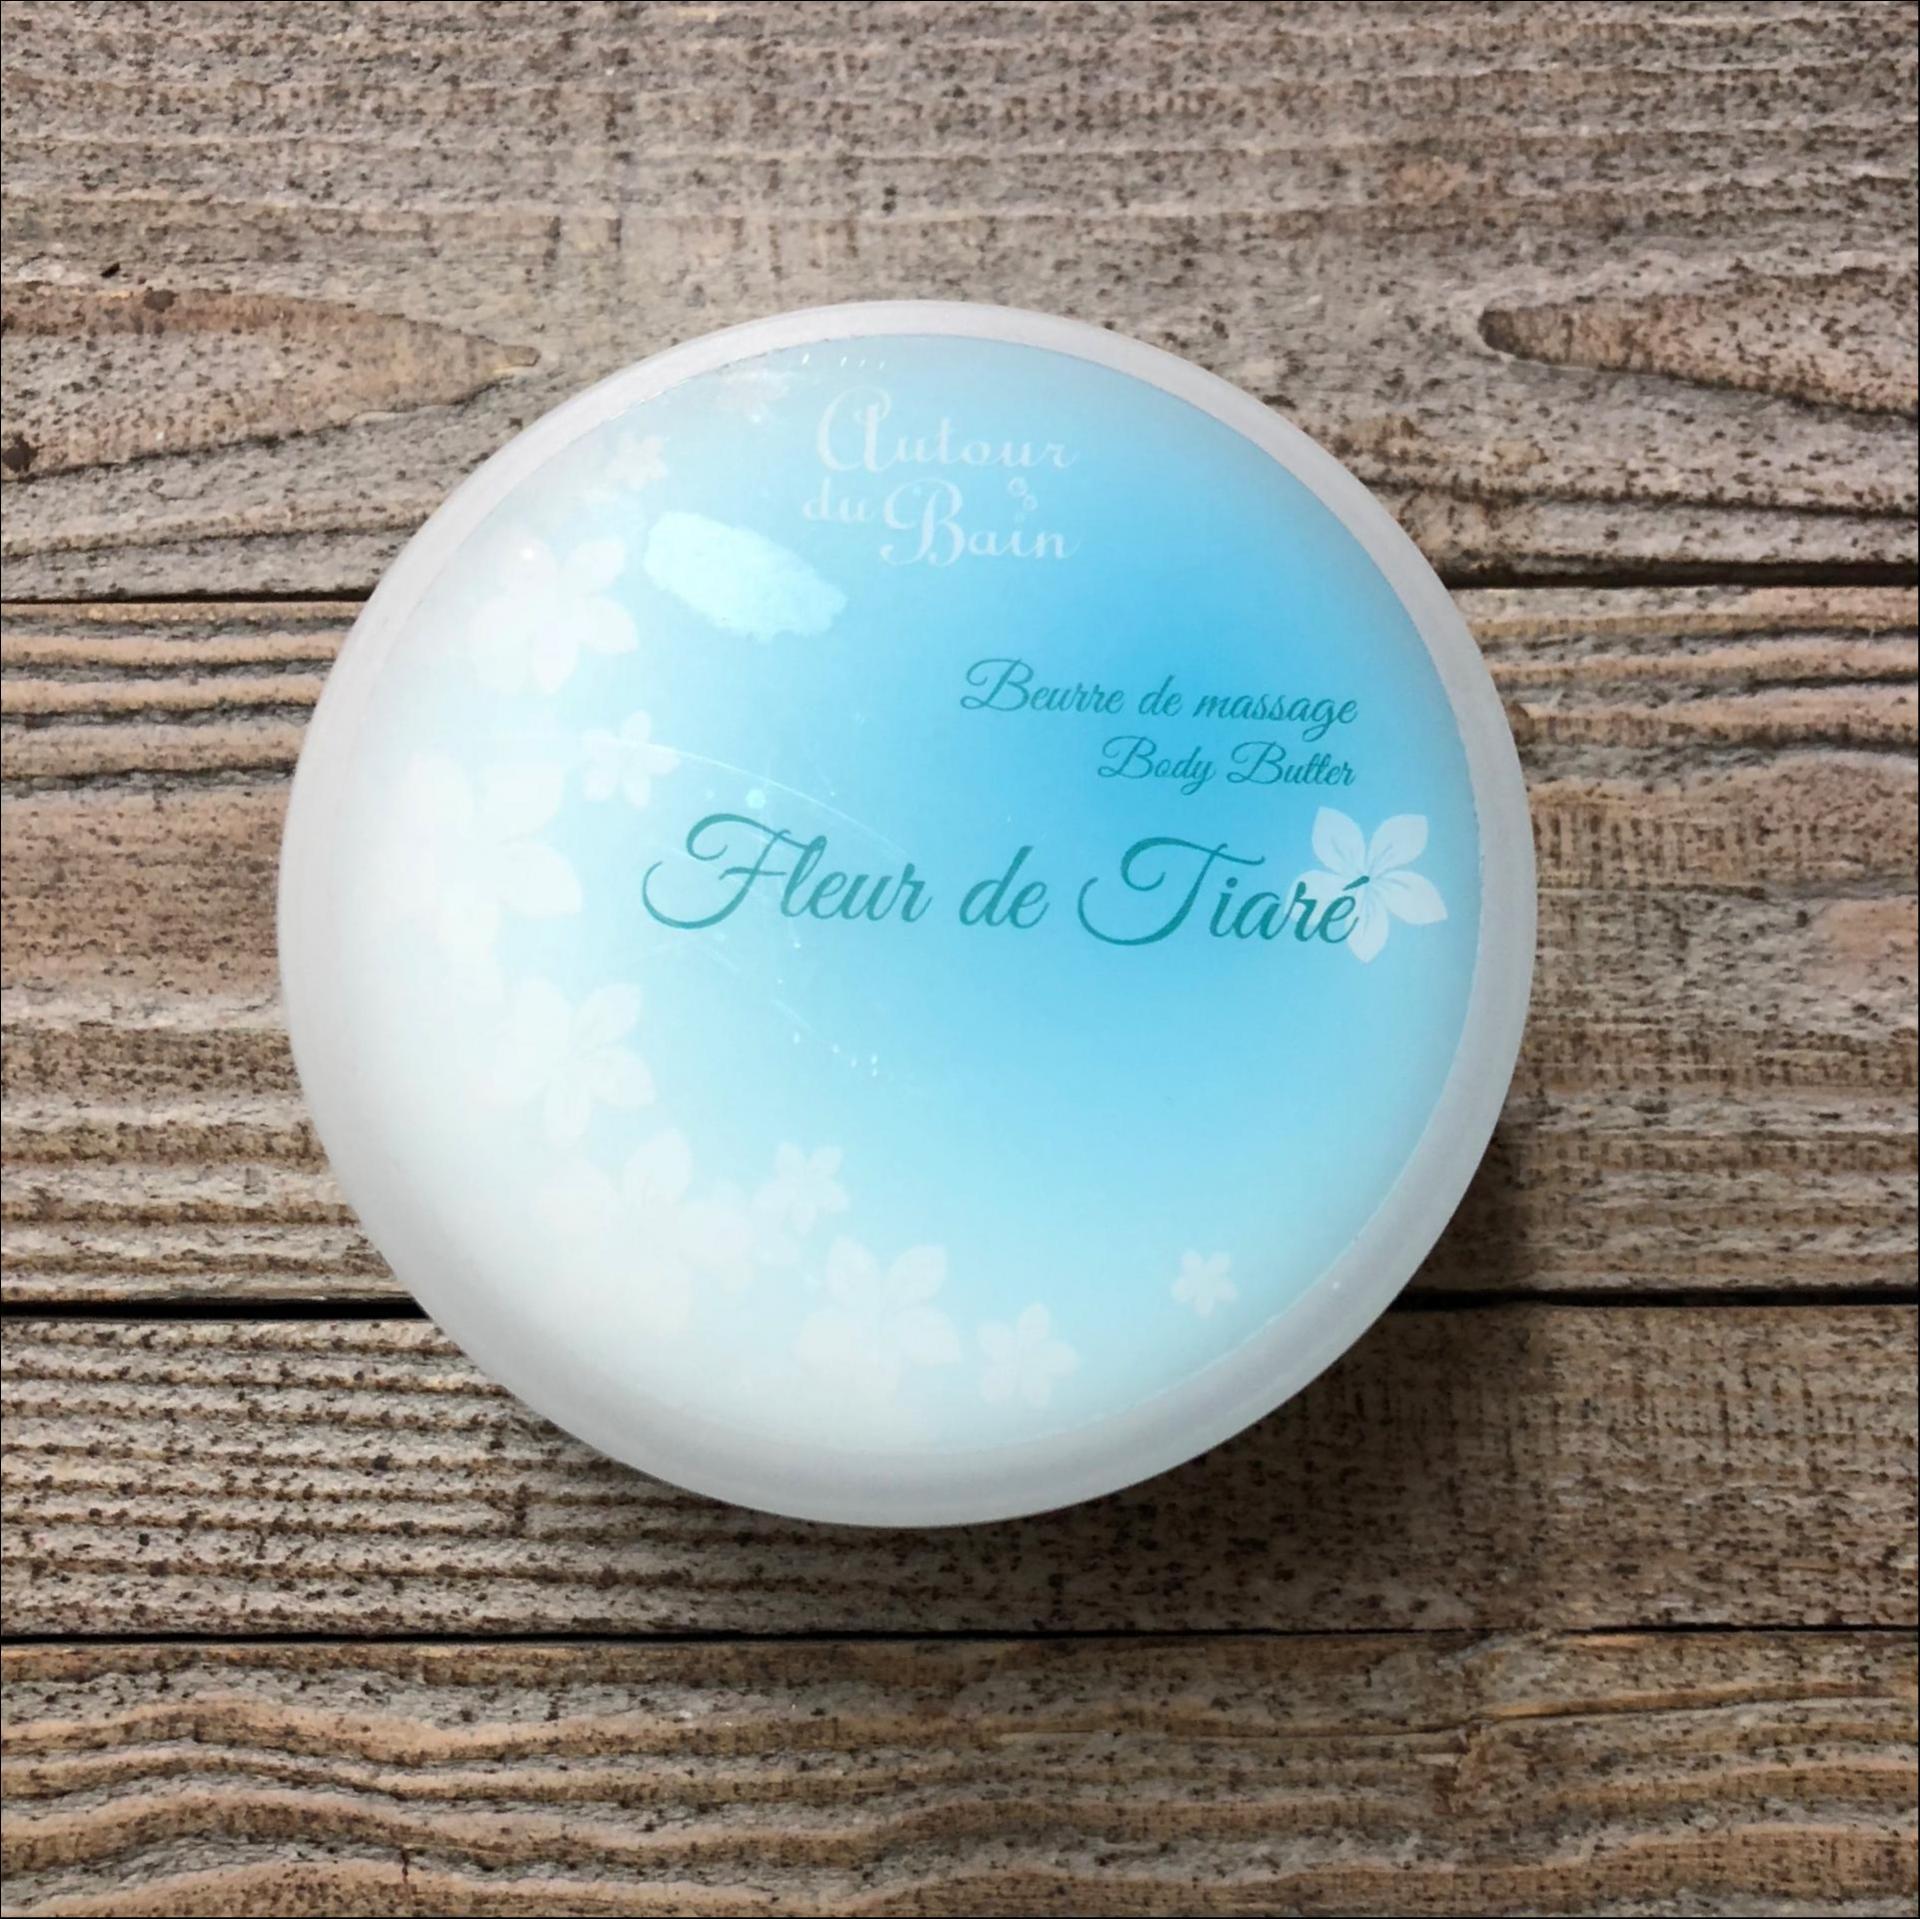 Beurre de massage fleur de tiare